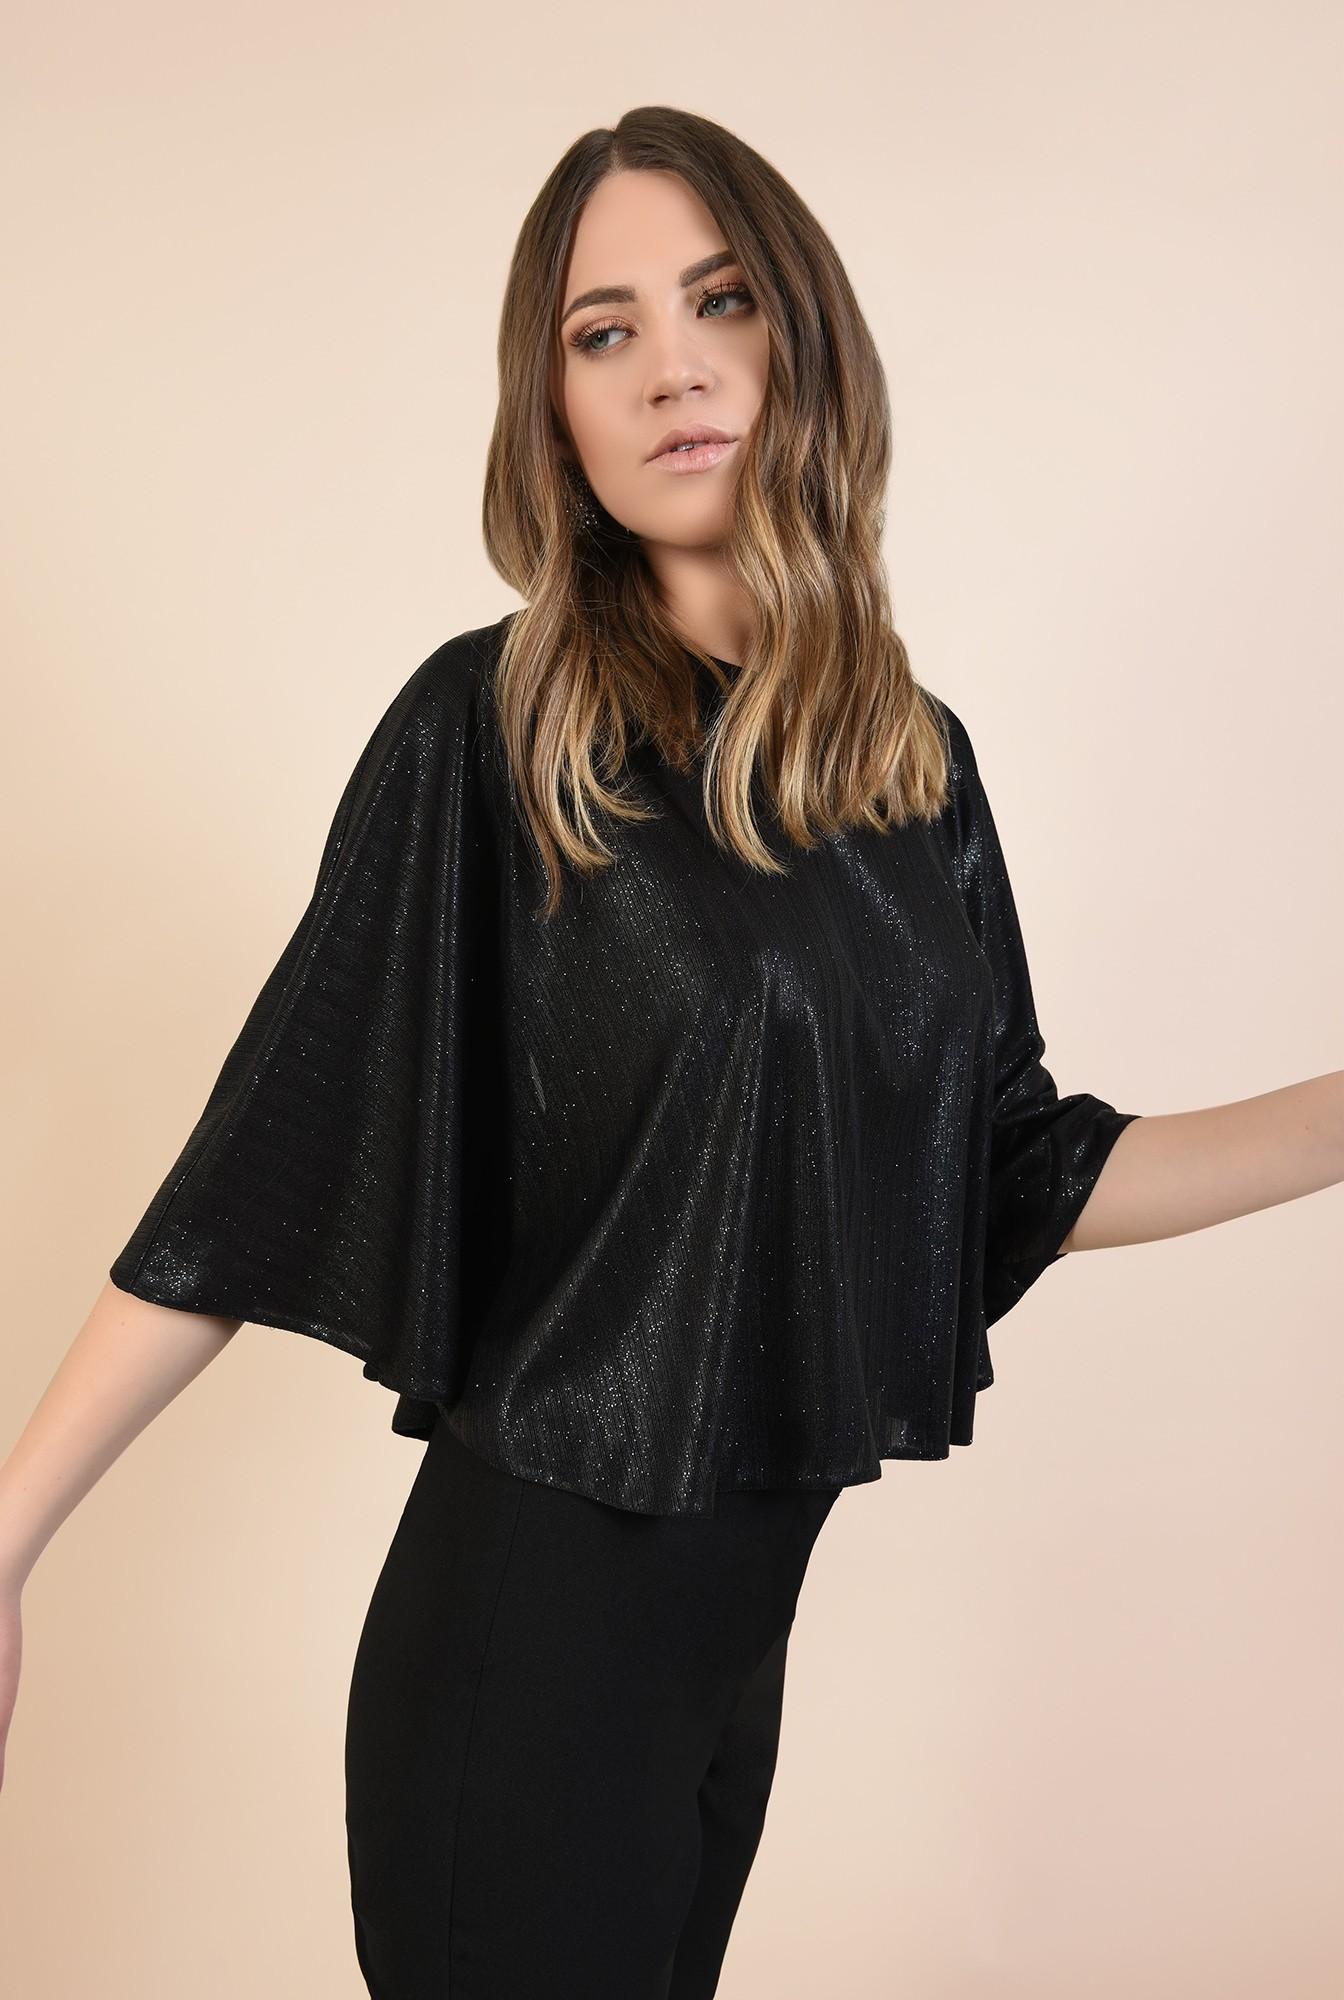 0 - bluza eleganta, tip capa, neagra, cu sclipici, maneci fluture, Poema